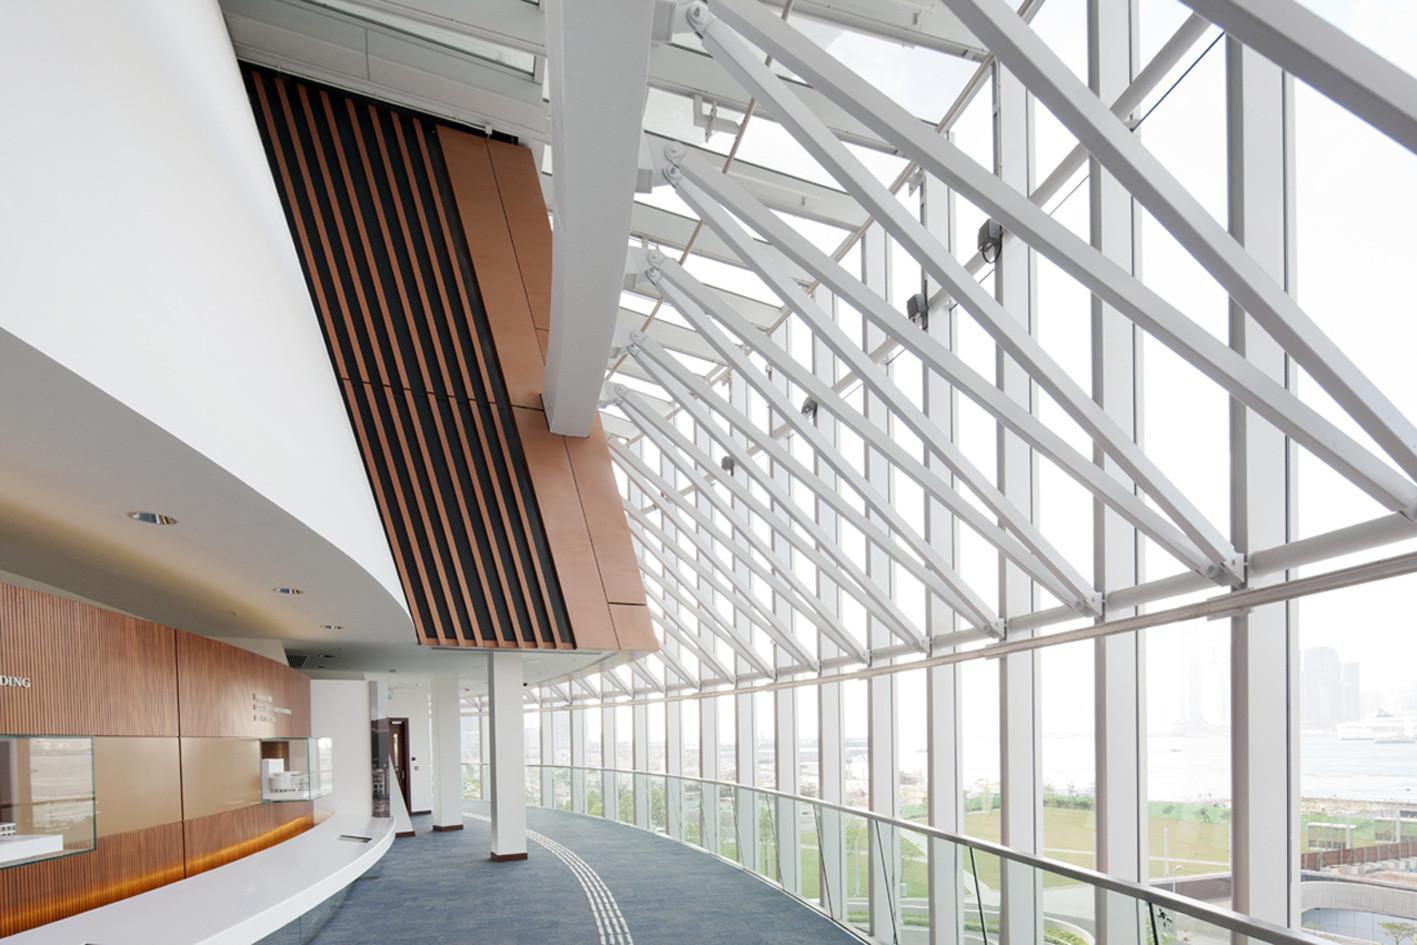 Image result for hksar government headquarters interior